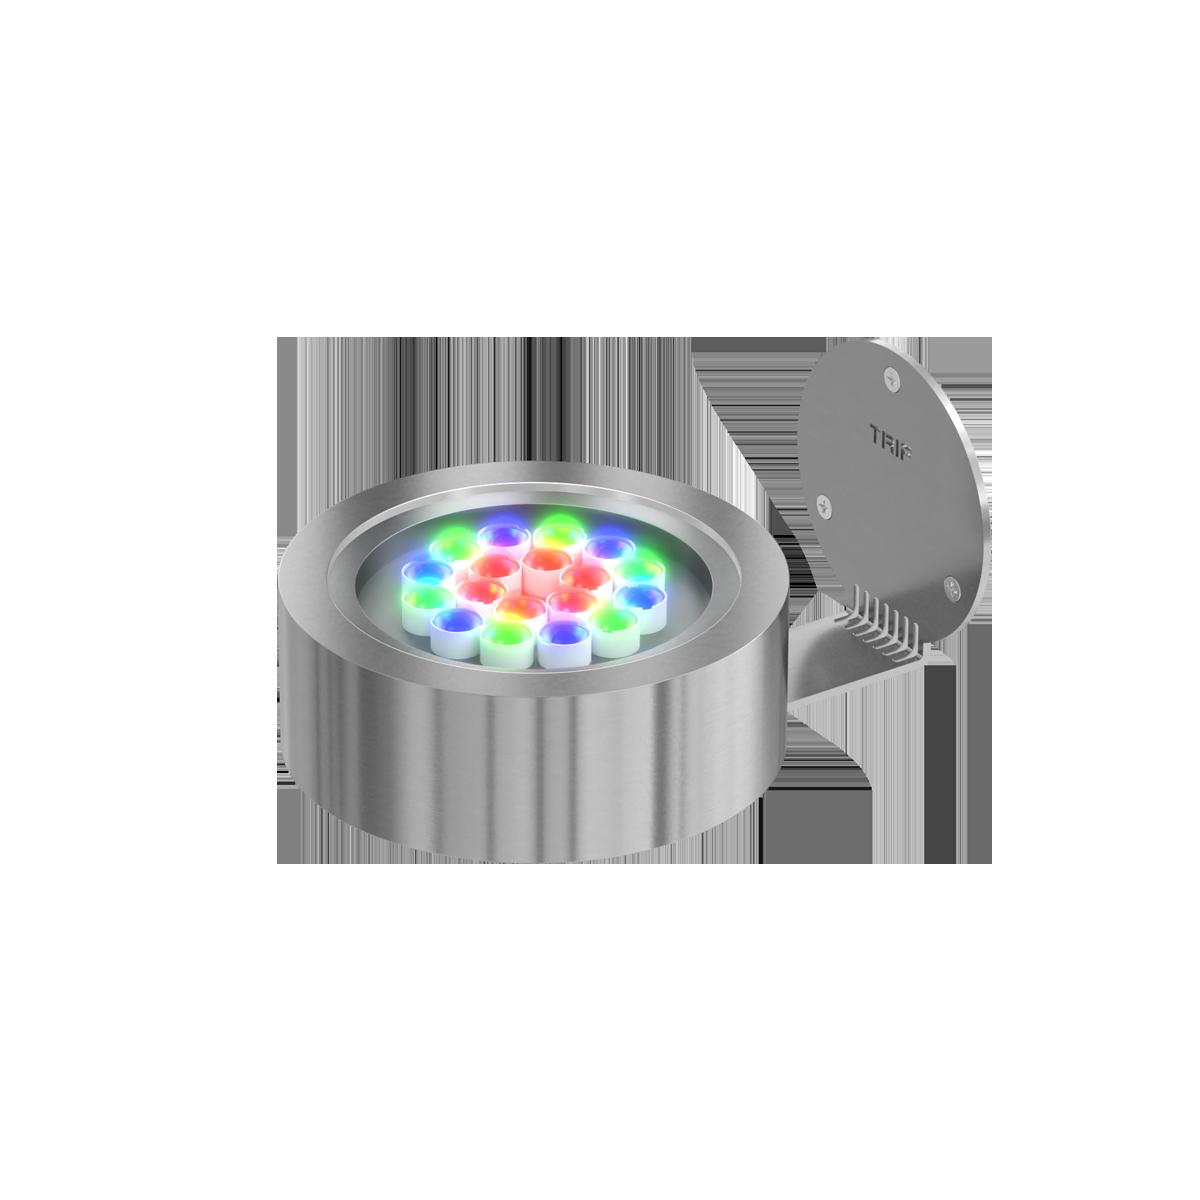 SATURN WALL - серия прожекторов для подсветки фасадов зданий